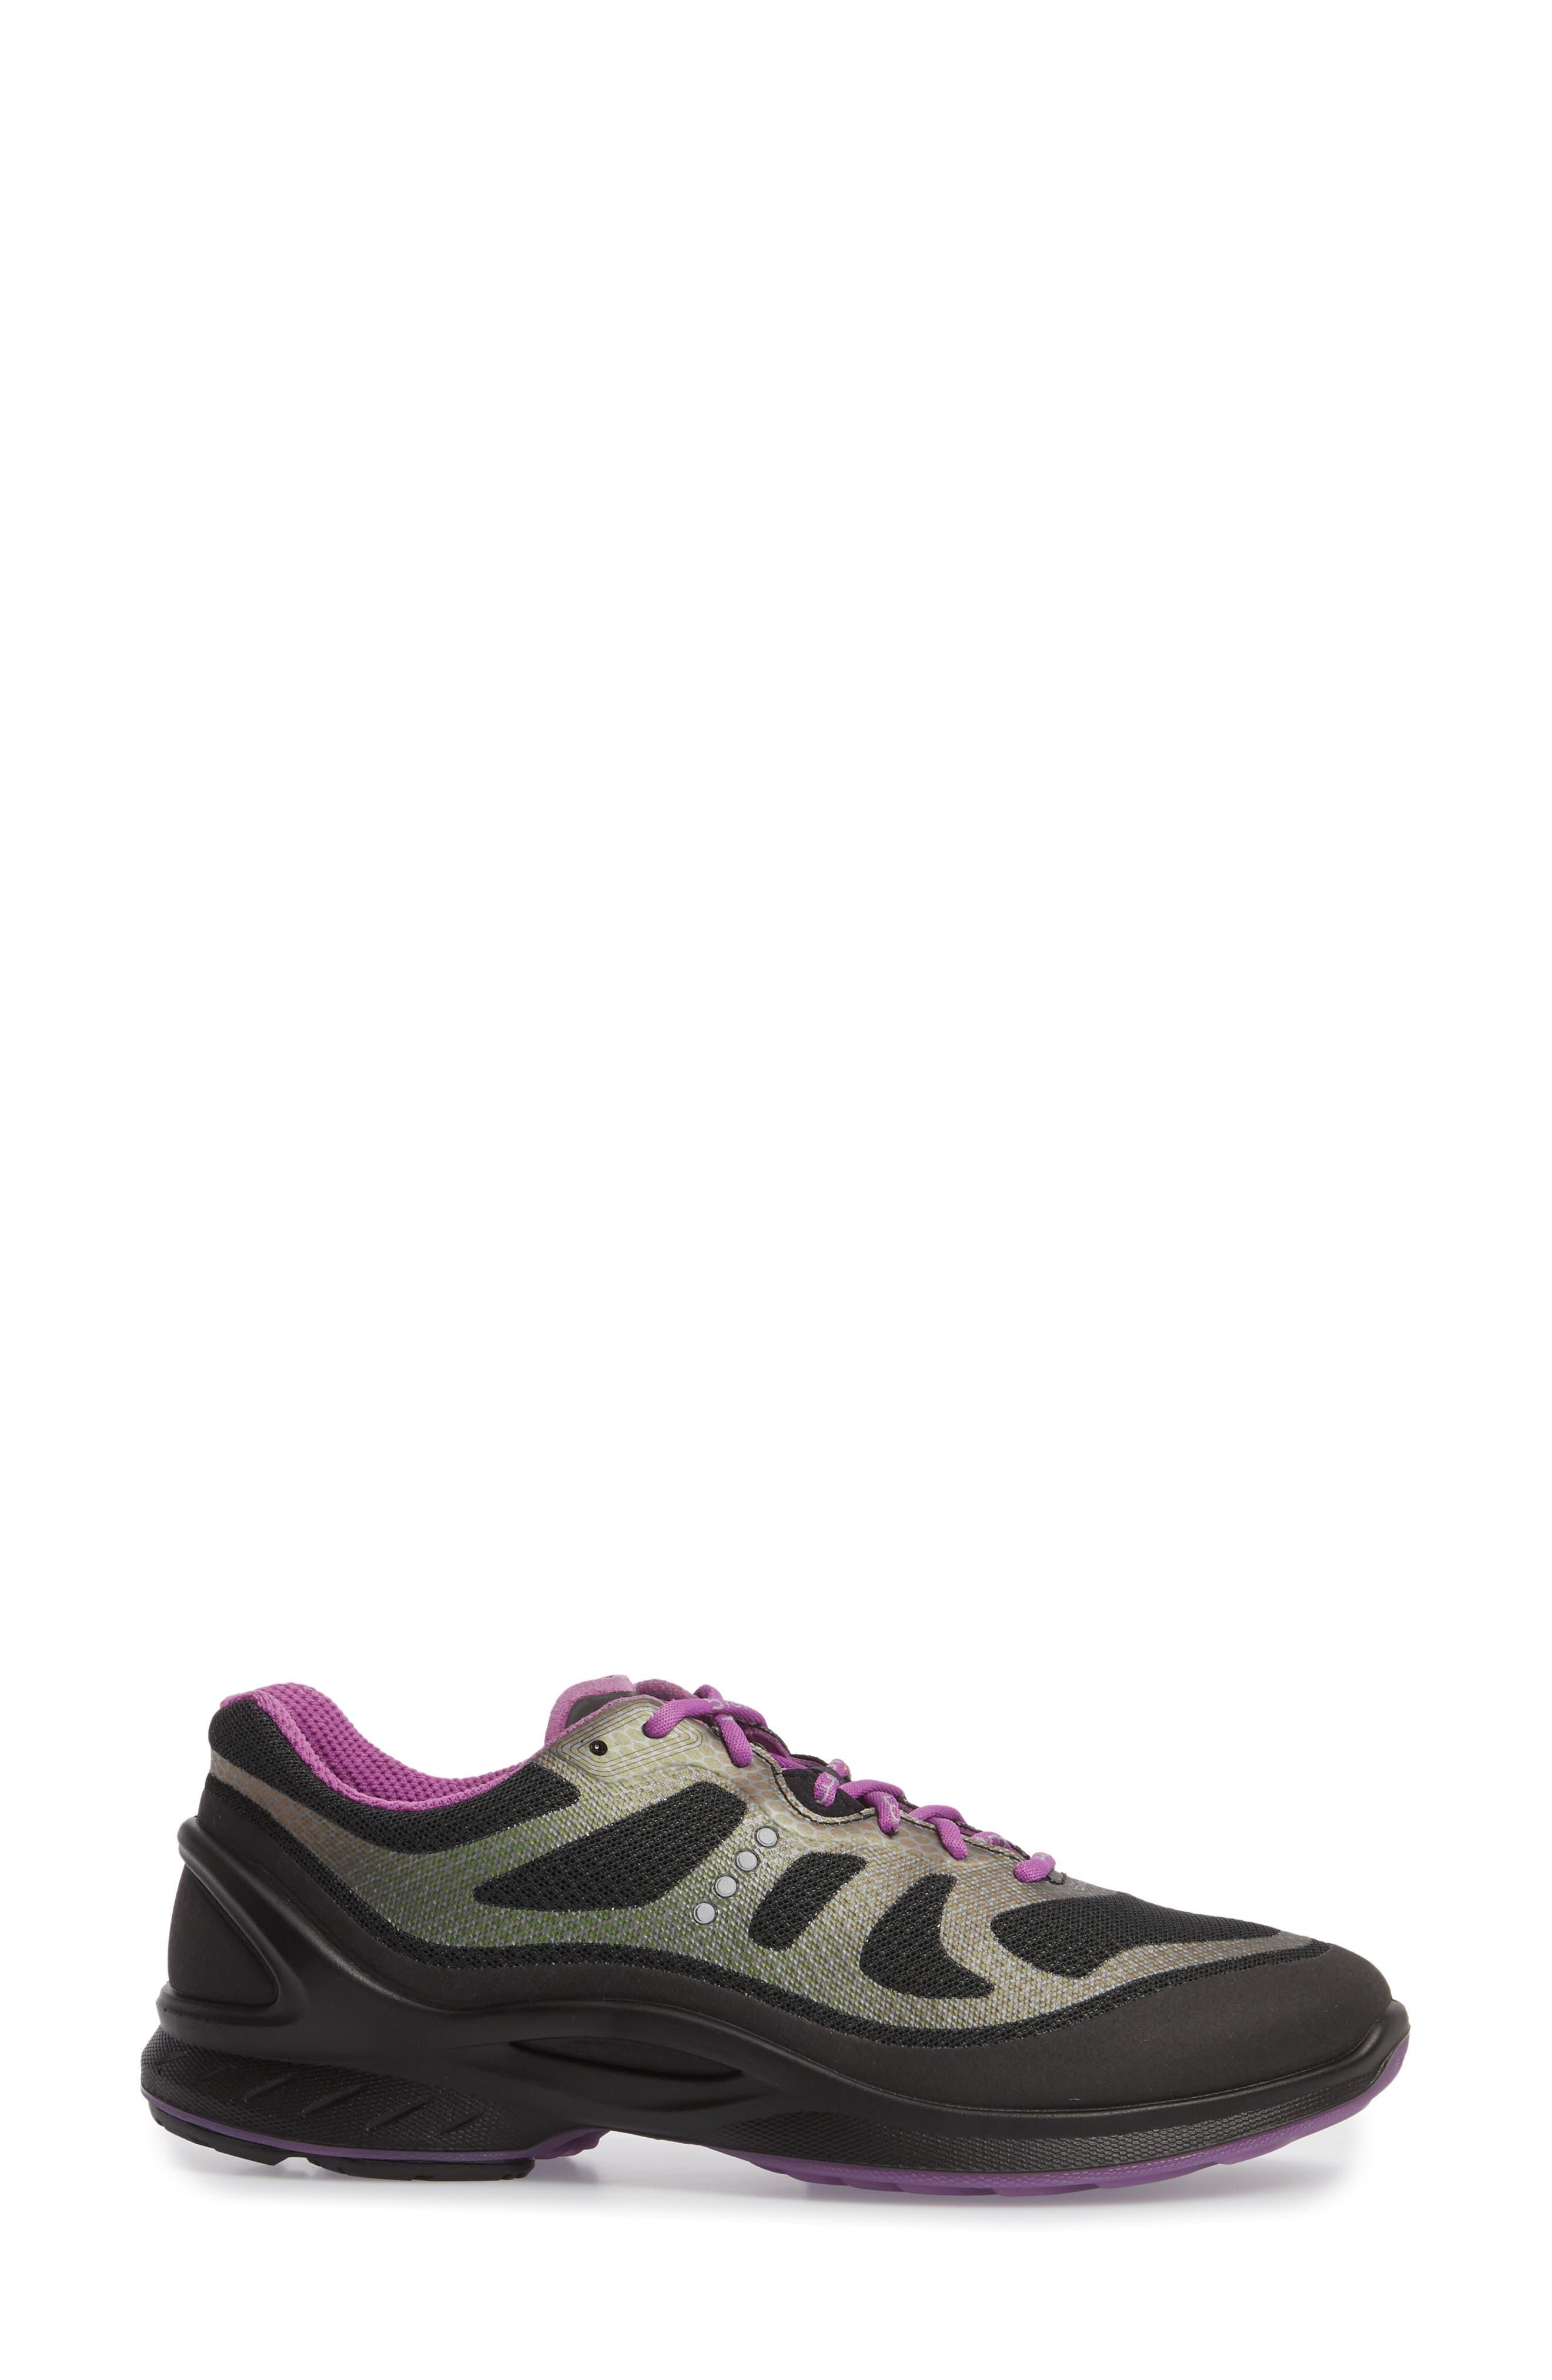 BIOM Fjuel Tie Sneaker,                             Alternate thumbnail 3, color,                             BLACK FABRIC